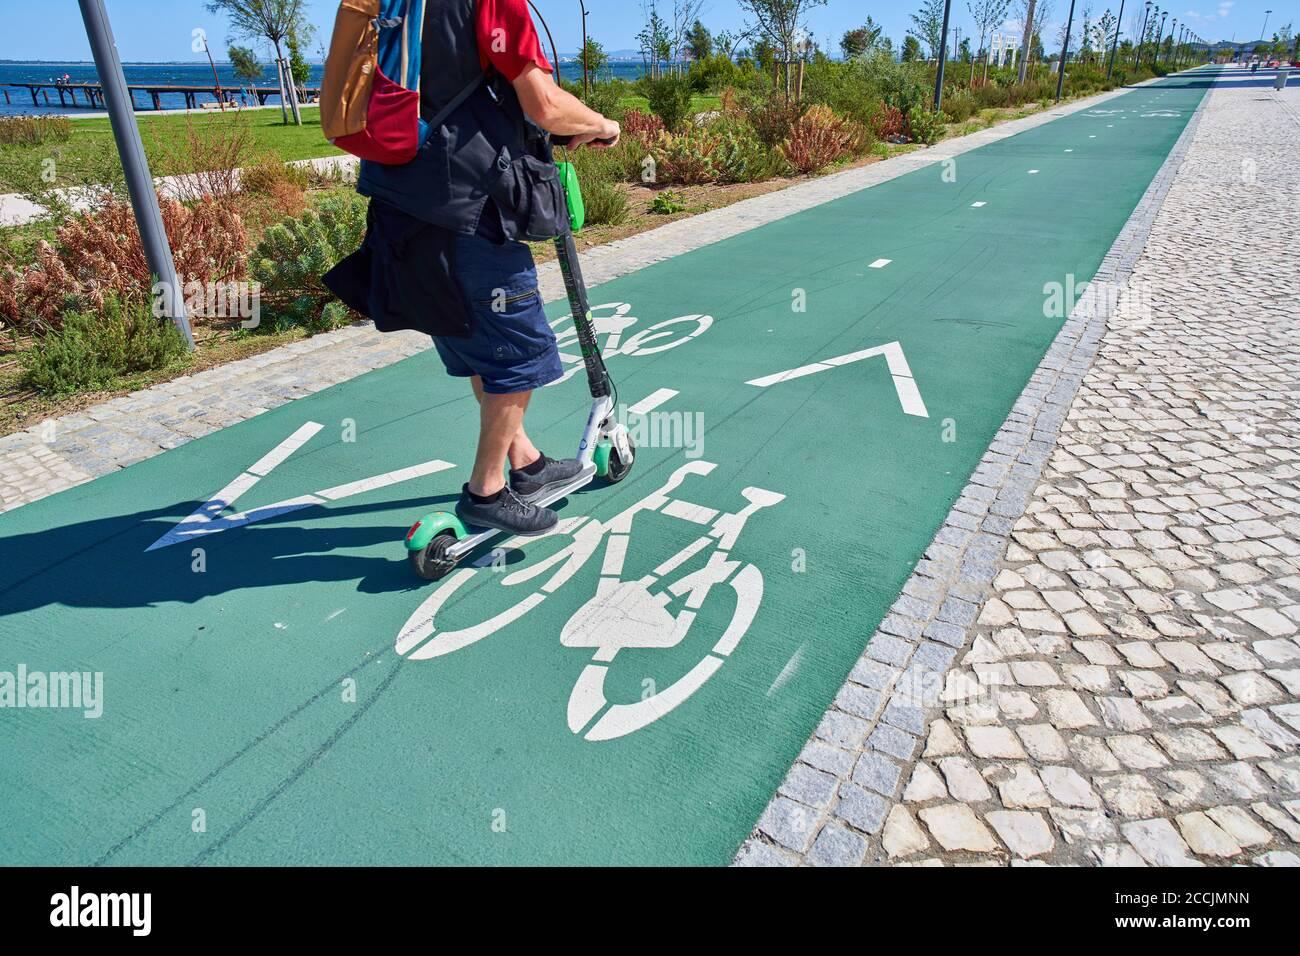 Lisbon, Lissabon, Portugal, 16rd August 2020.  A man driving an e-scooter on a bicycle track. © Peter Schatz / Alamy Stock Photos Stock Photo